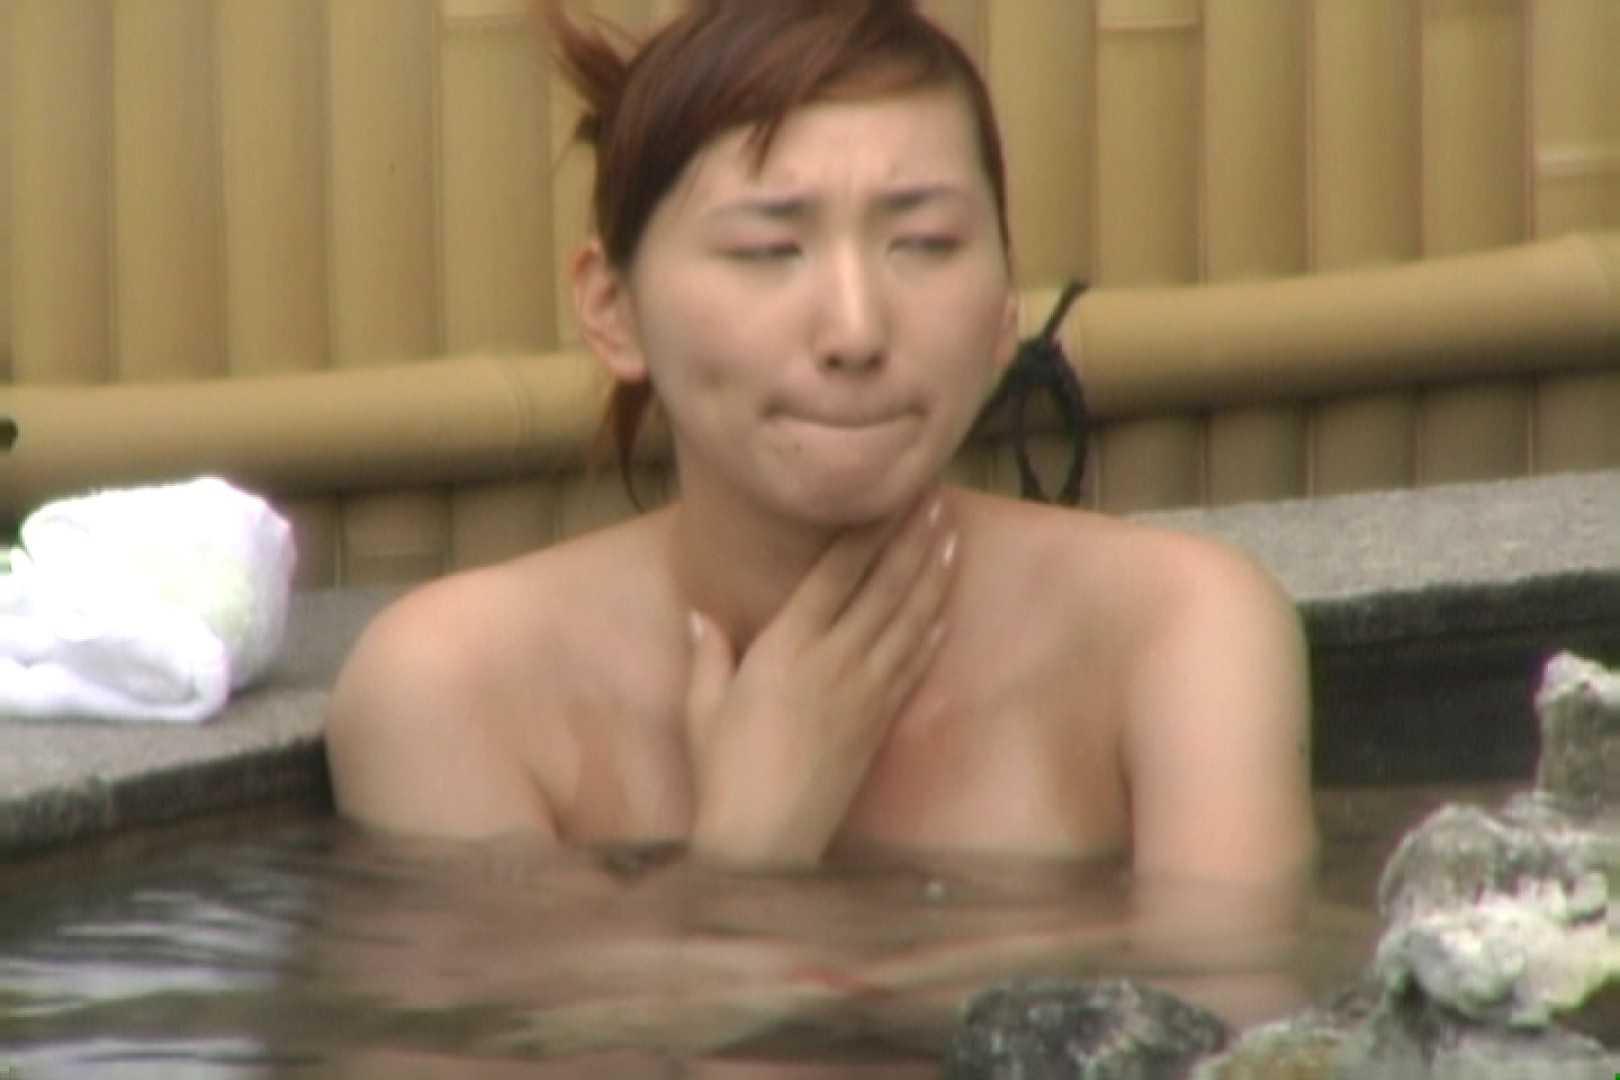 Aquaな露天風呂Vol.616 露天   OLセックス  99画像 94